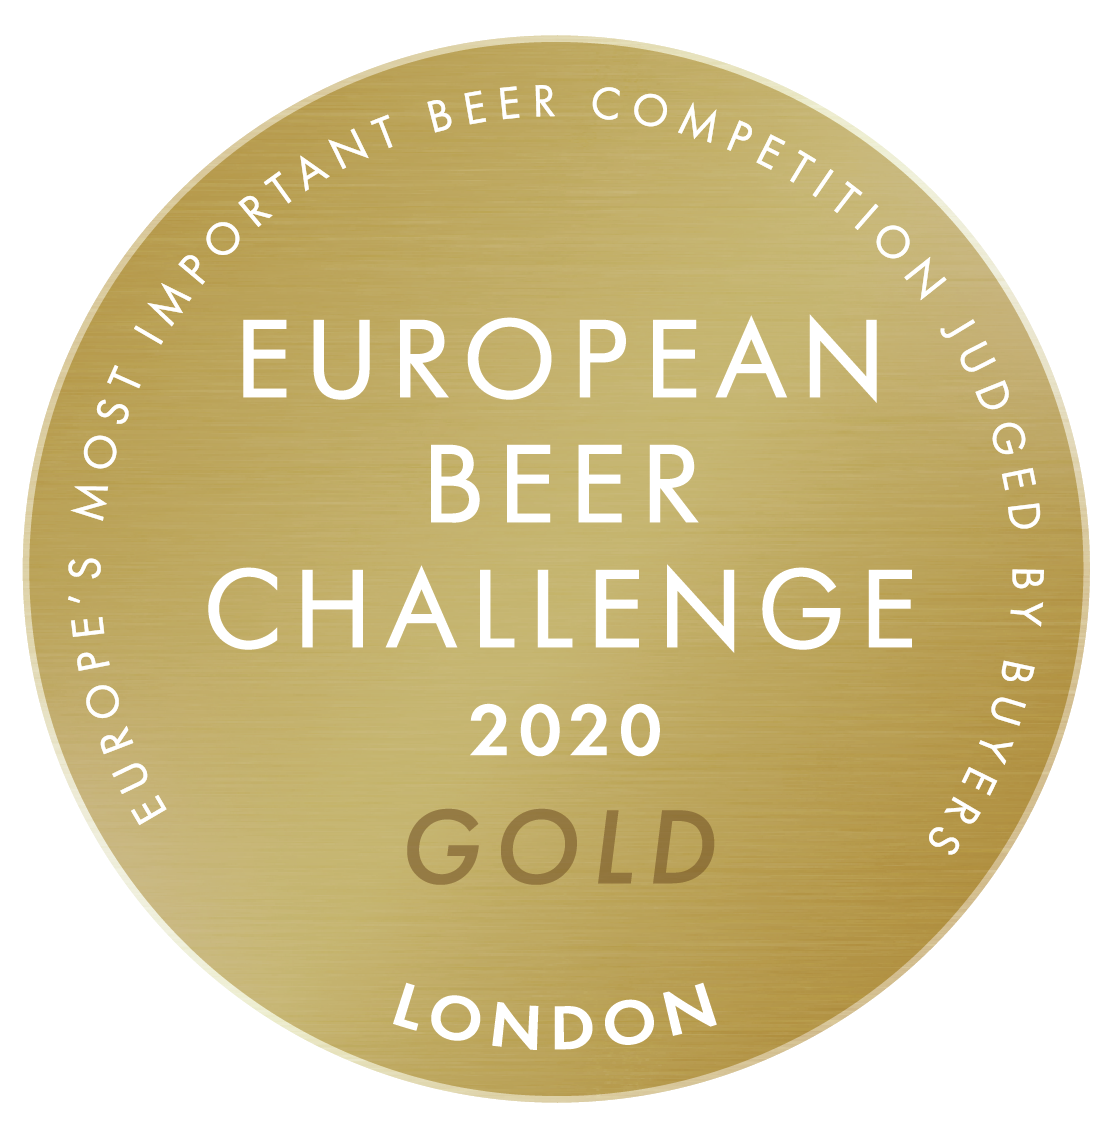 European Beer Challenge Gold Awards